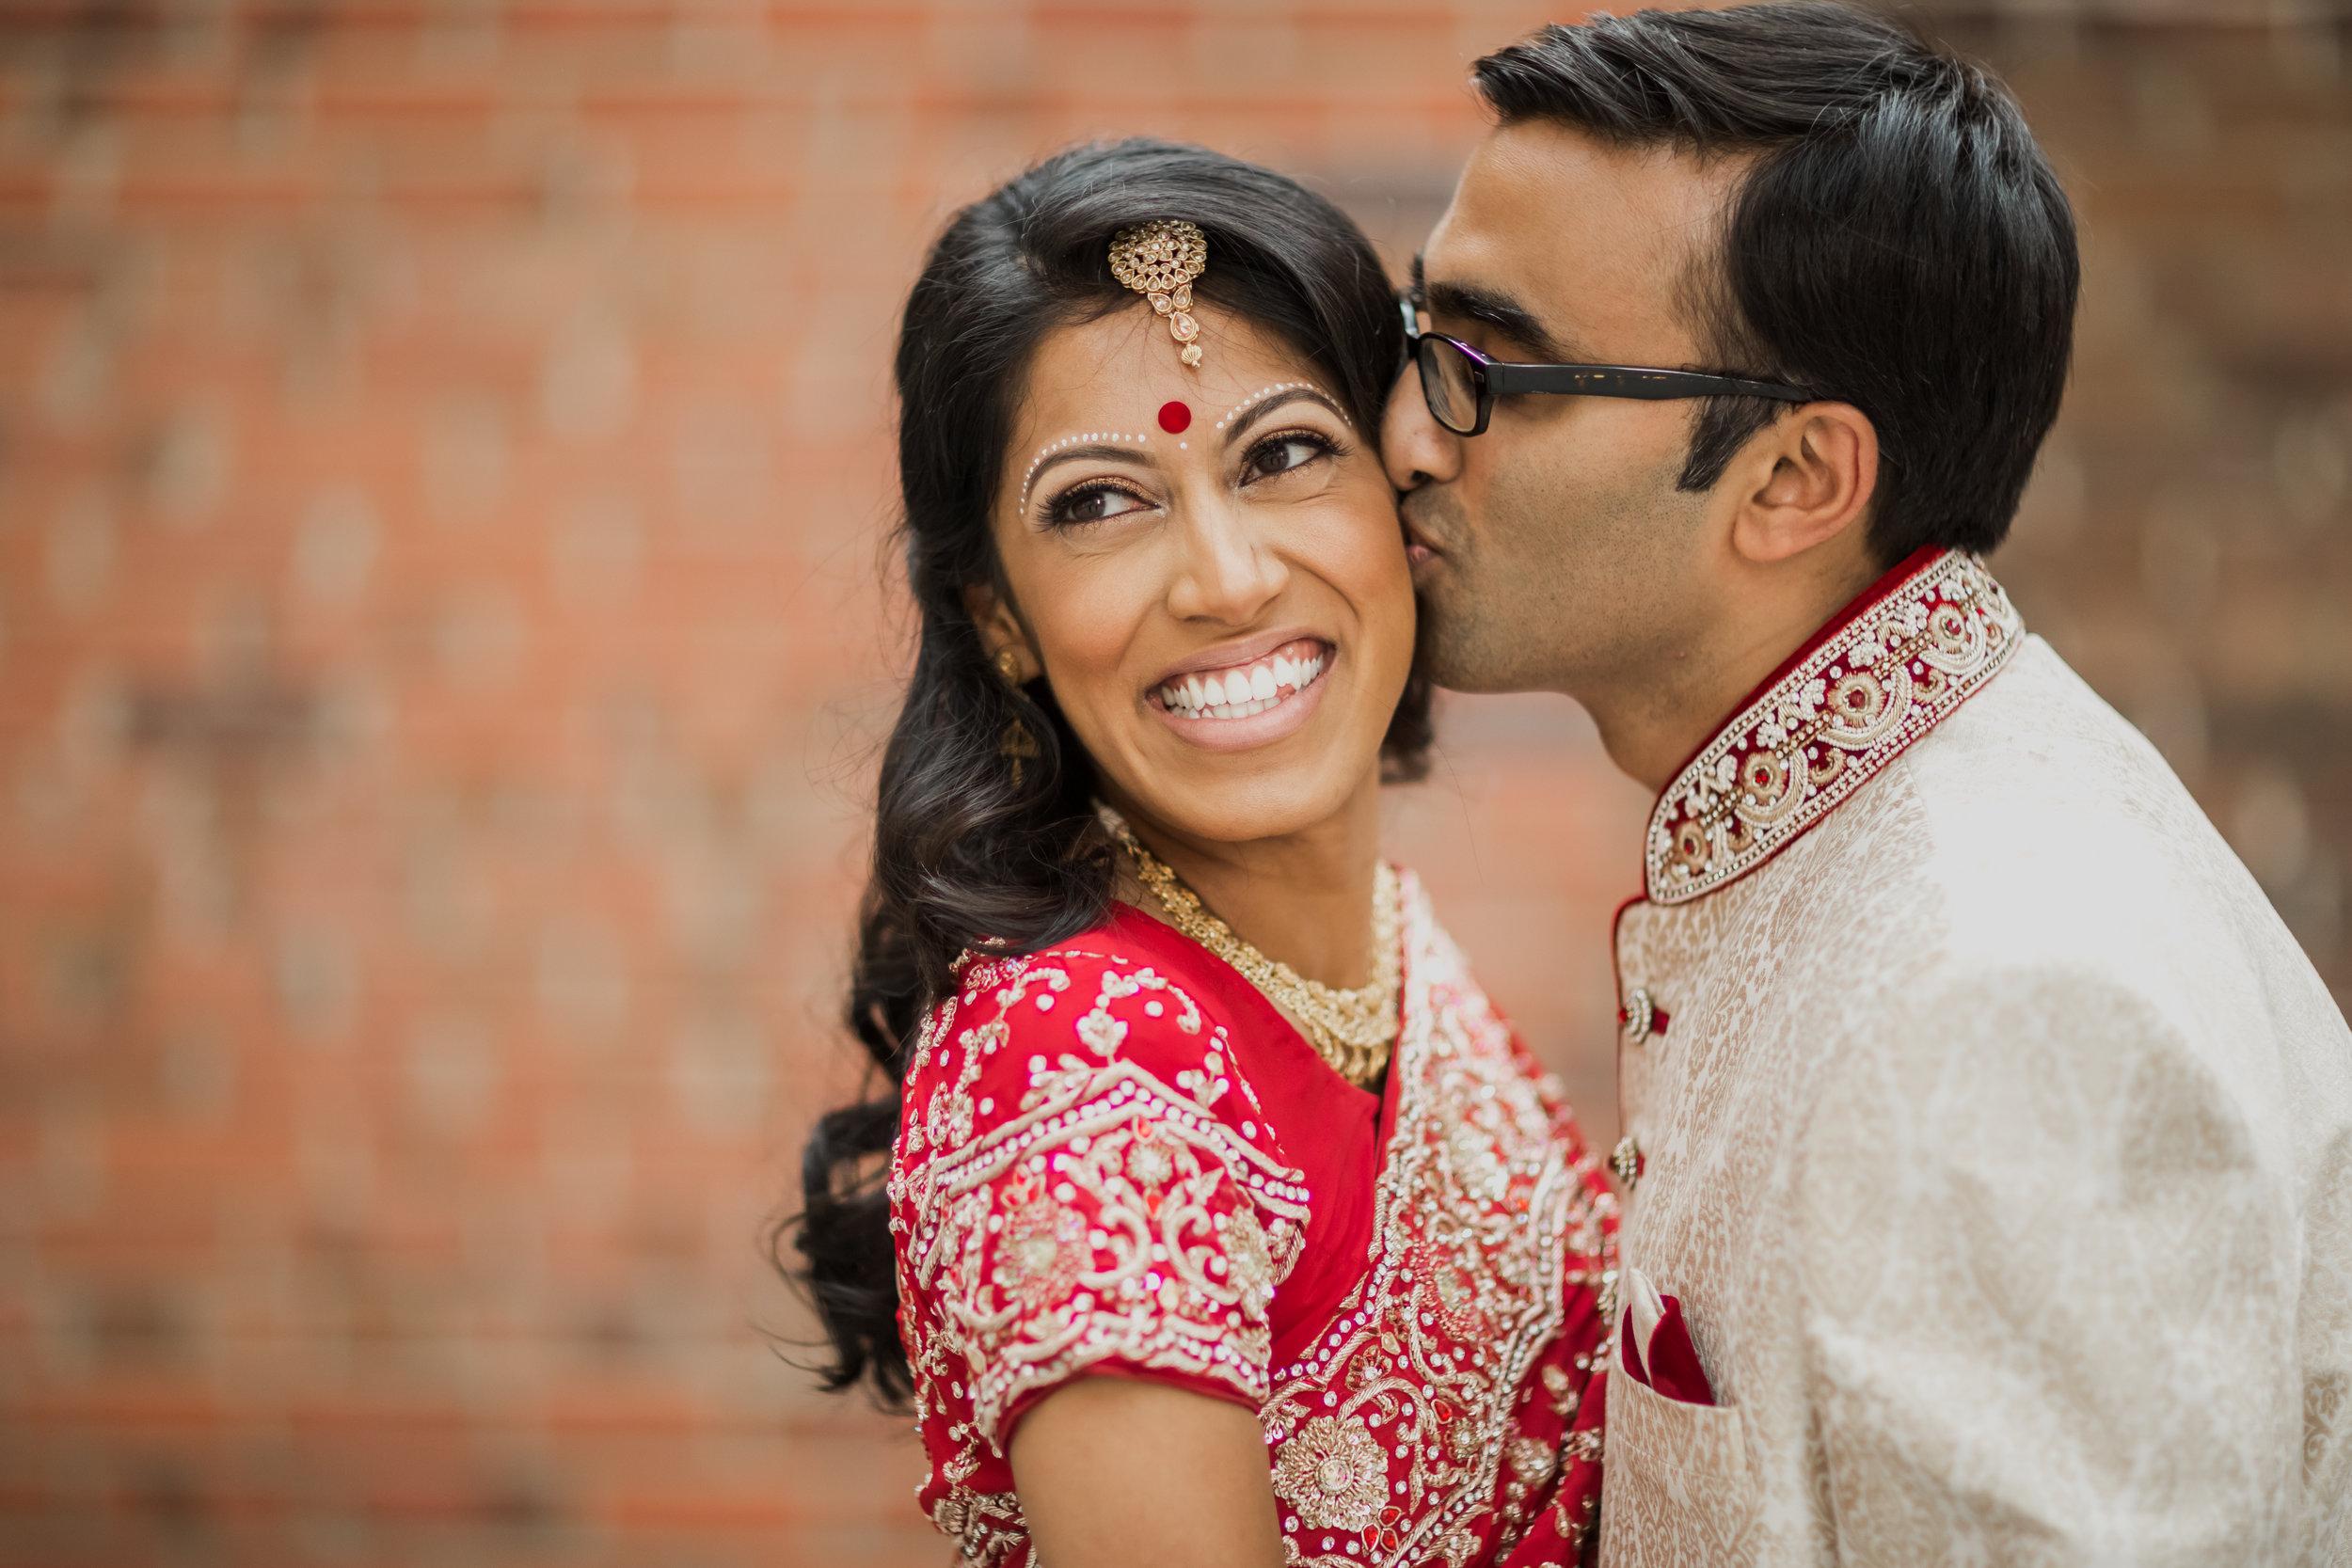 Das-Shah Wedding-0262.jpg